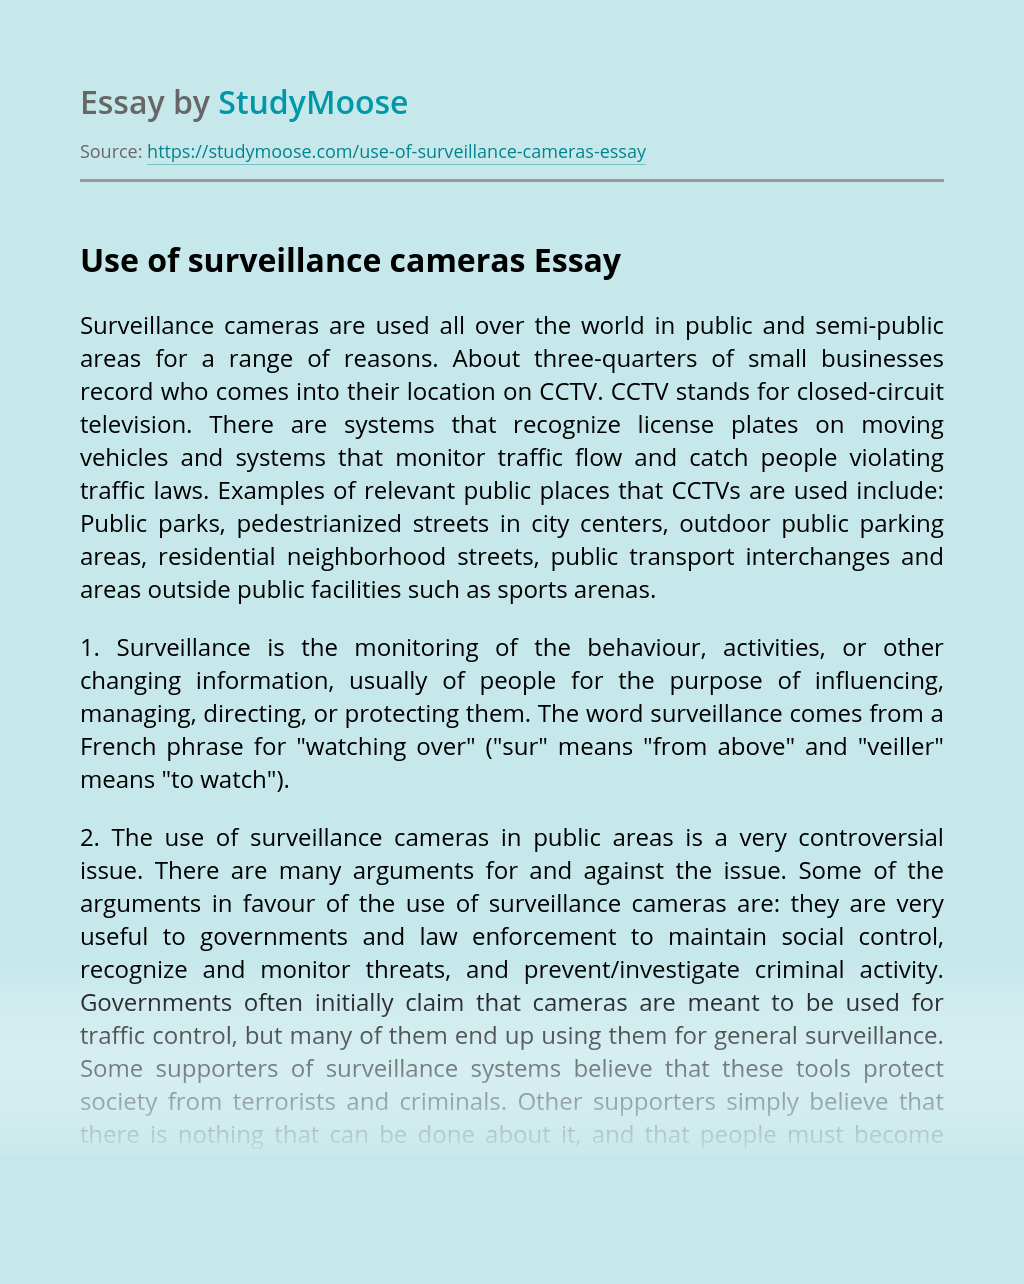 Use of surveillance cameras